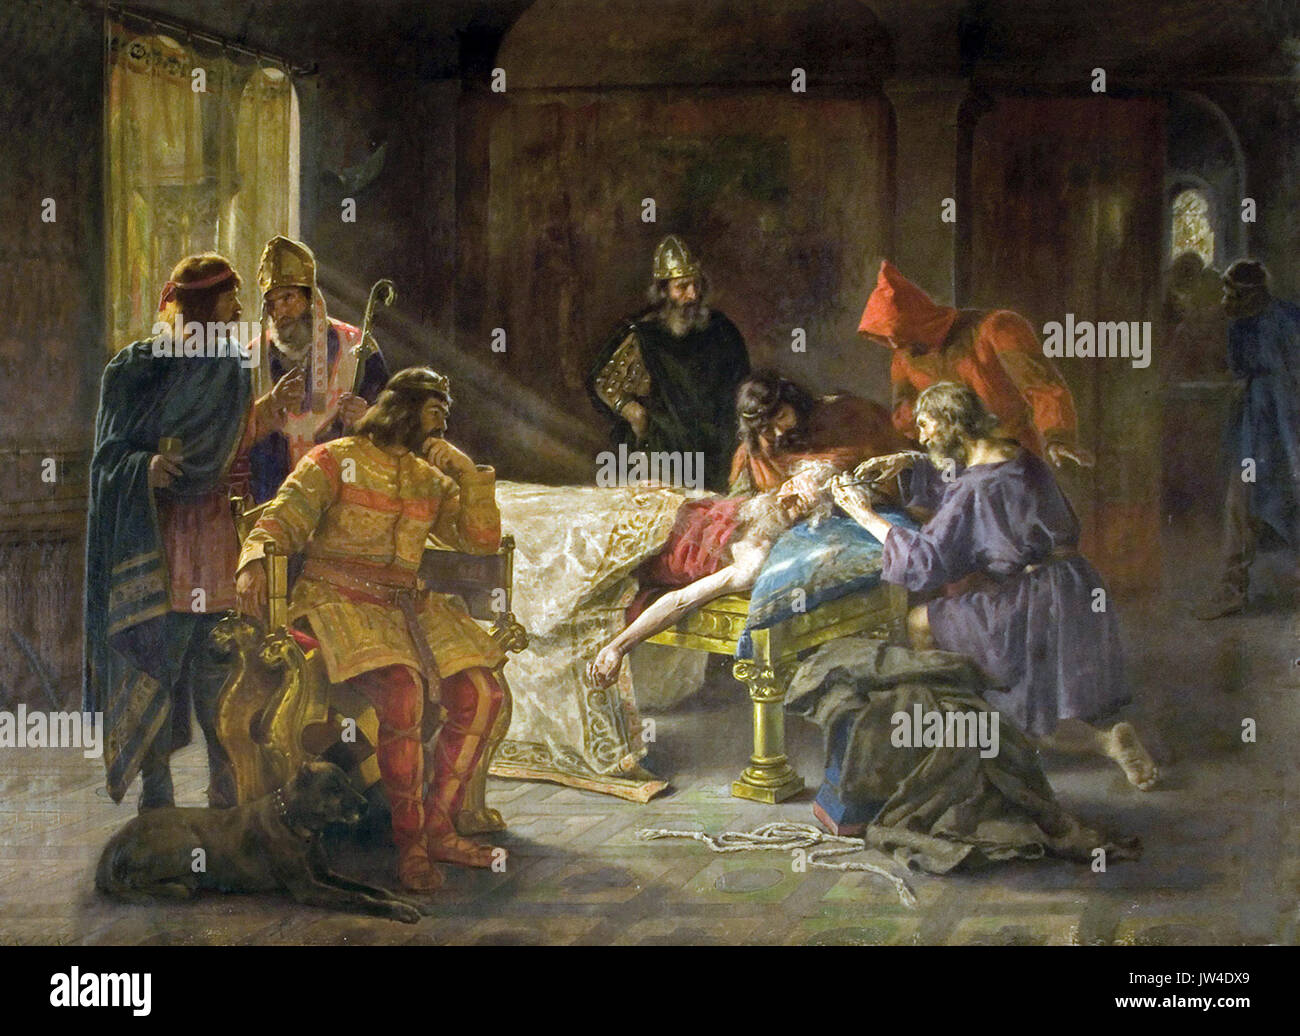 La tonsura del rei Wamba   Joan Brull i Vinyoles (1863 1912) Stock Photo